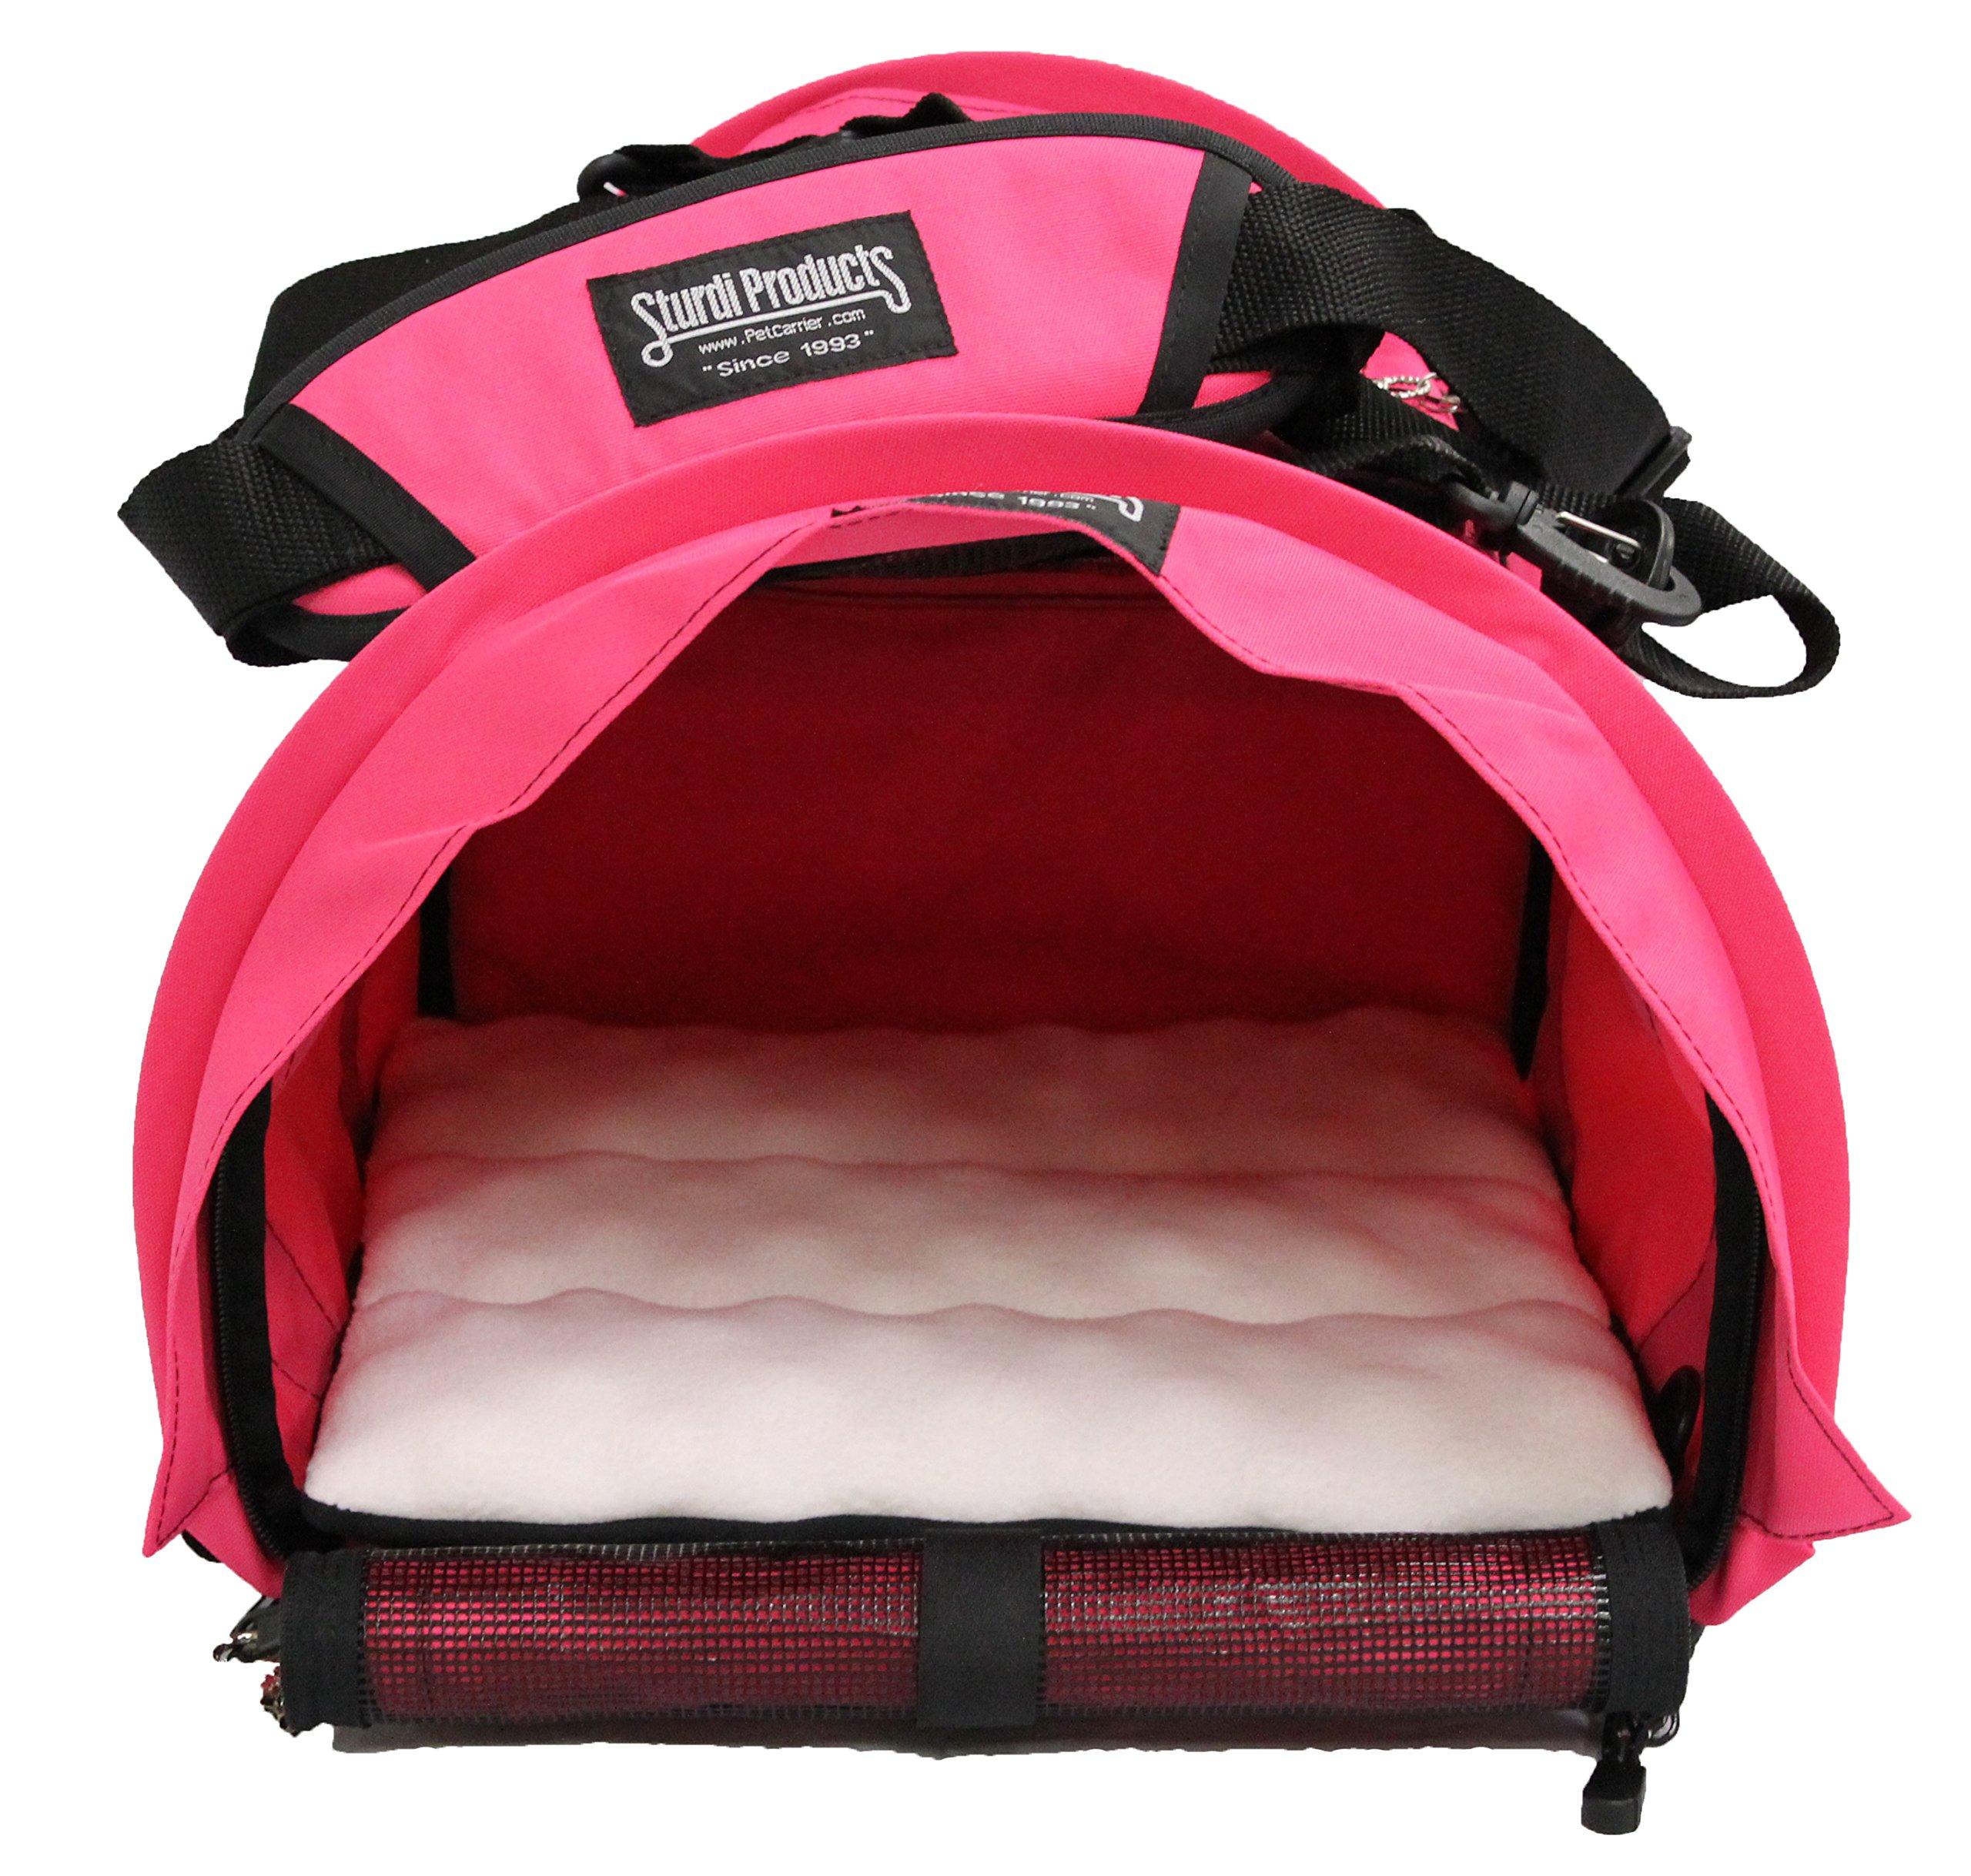 STURDI PRODUCTS SturdiBag Cube Large Pet Carrier, Hot Pink by STURDI PRODUCTS